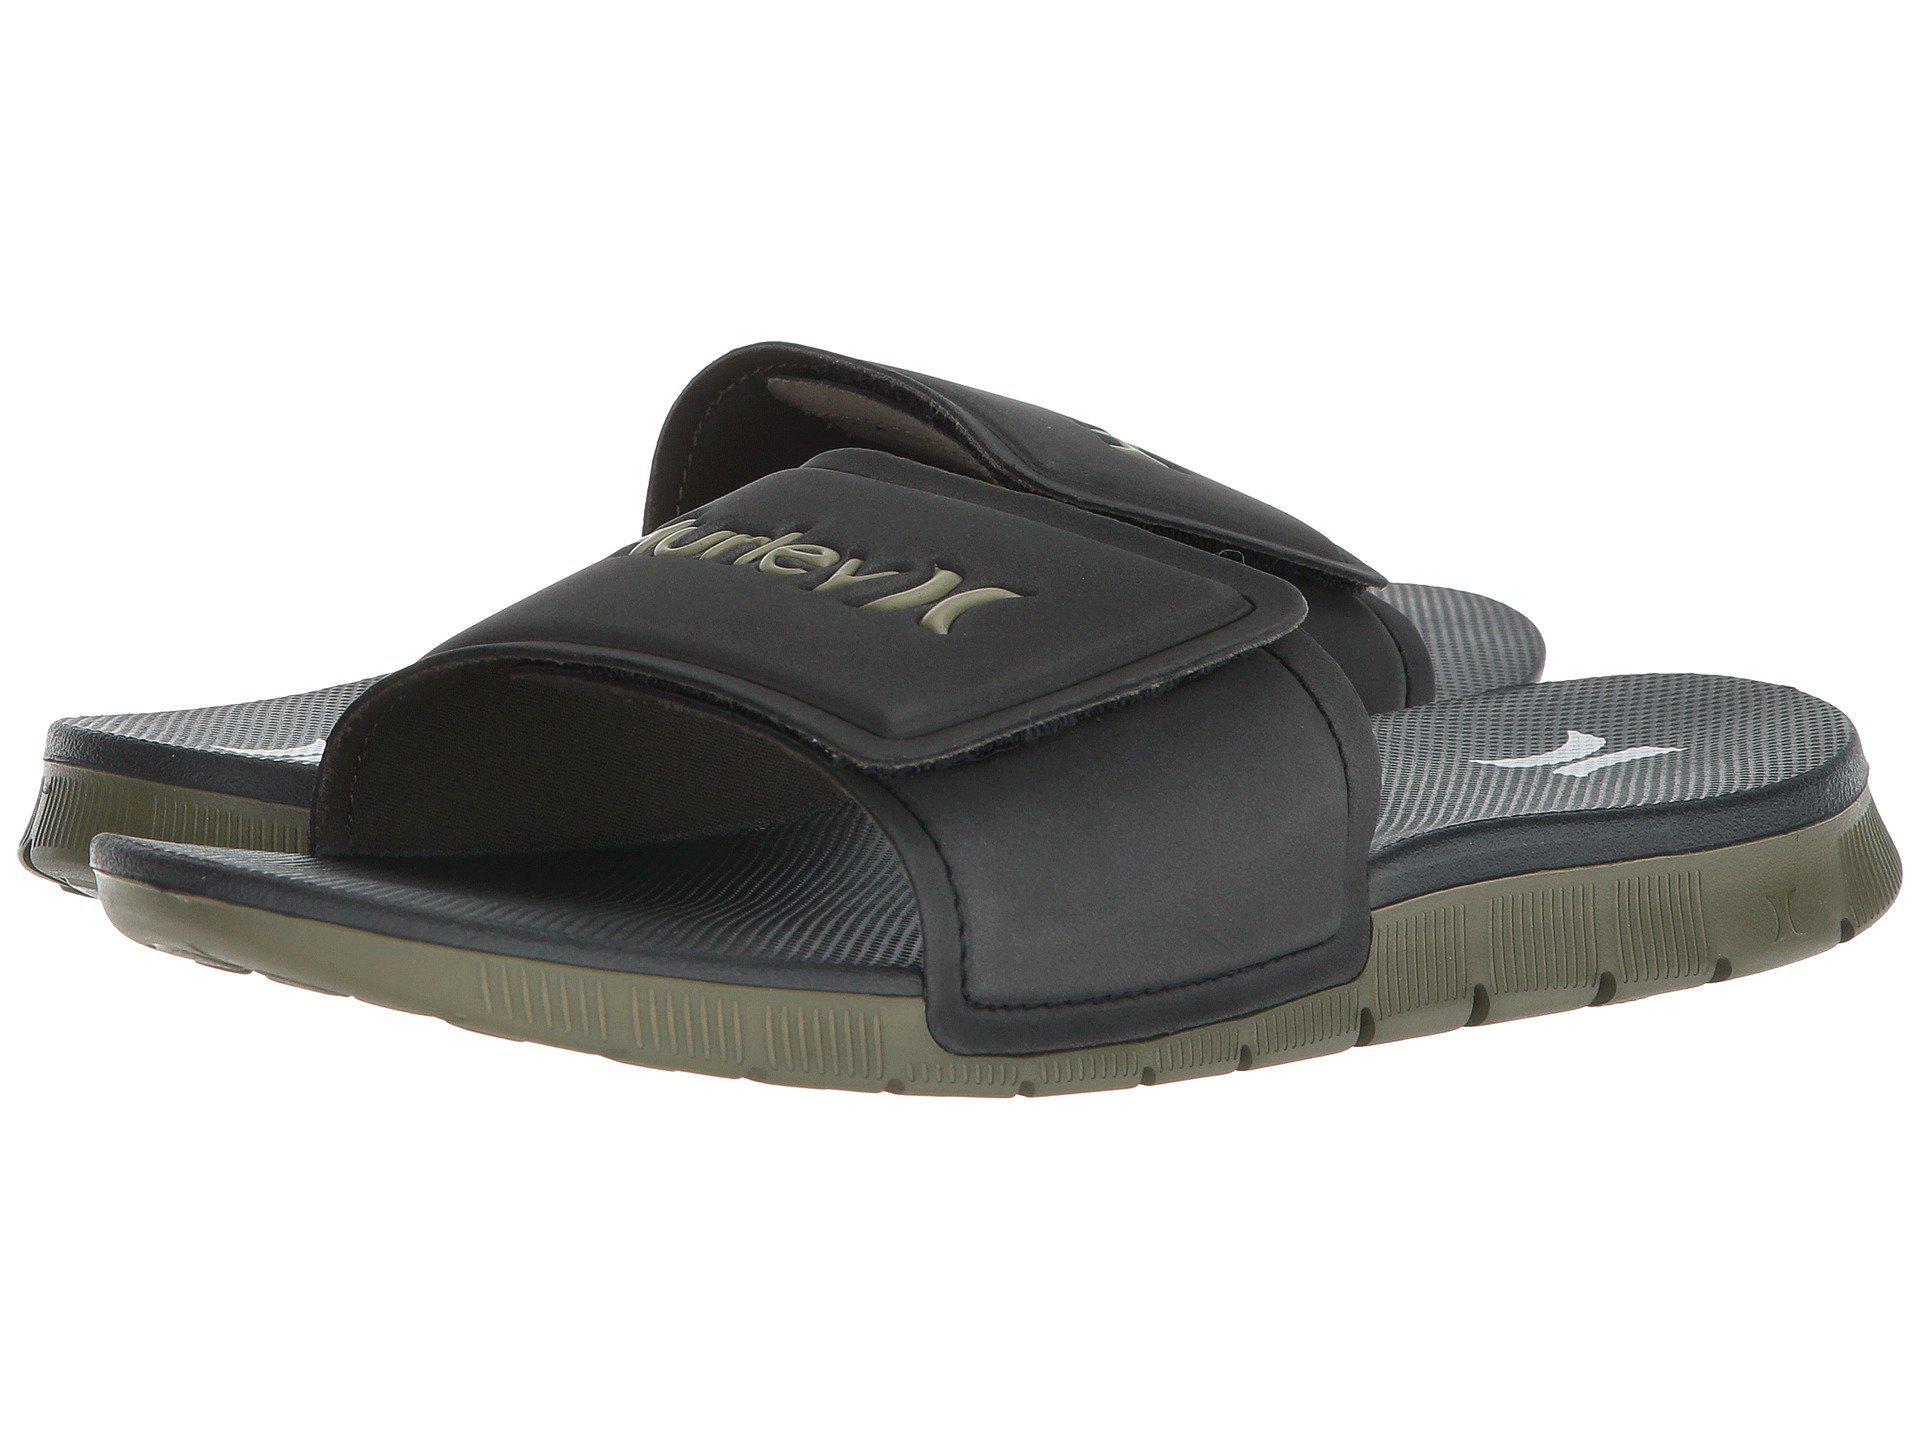 360528139b0b Lyst - Hurley Fusion 2.0 Slide (black) Men s Slide Shoes in Black ...